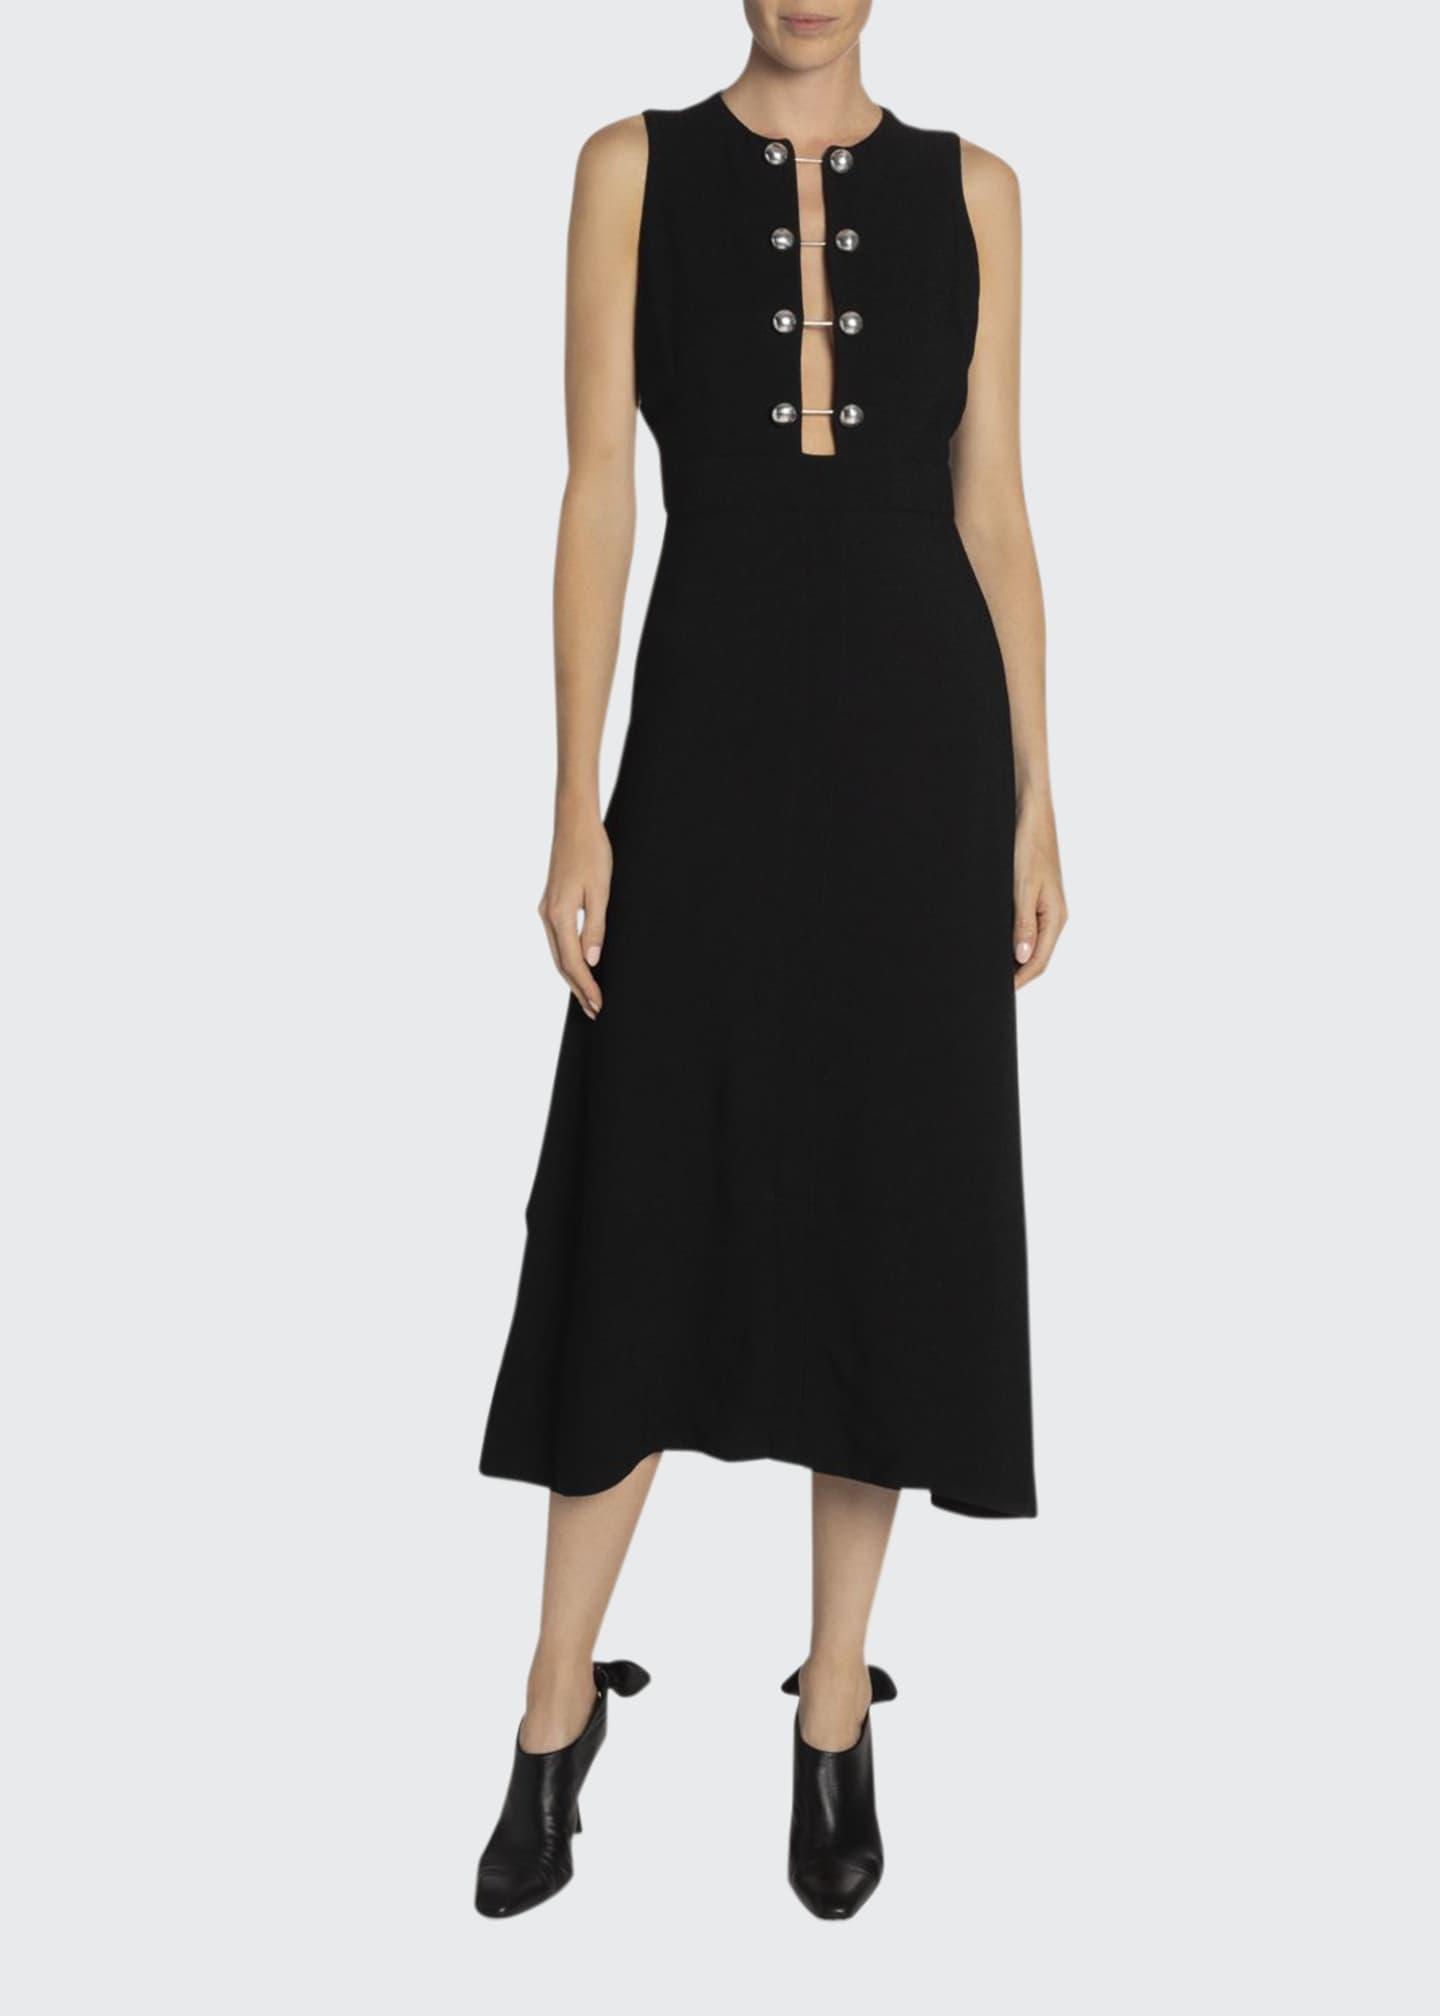 Proenza Schouler Sleeveless Barbell-Front Midi Dress